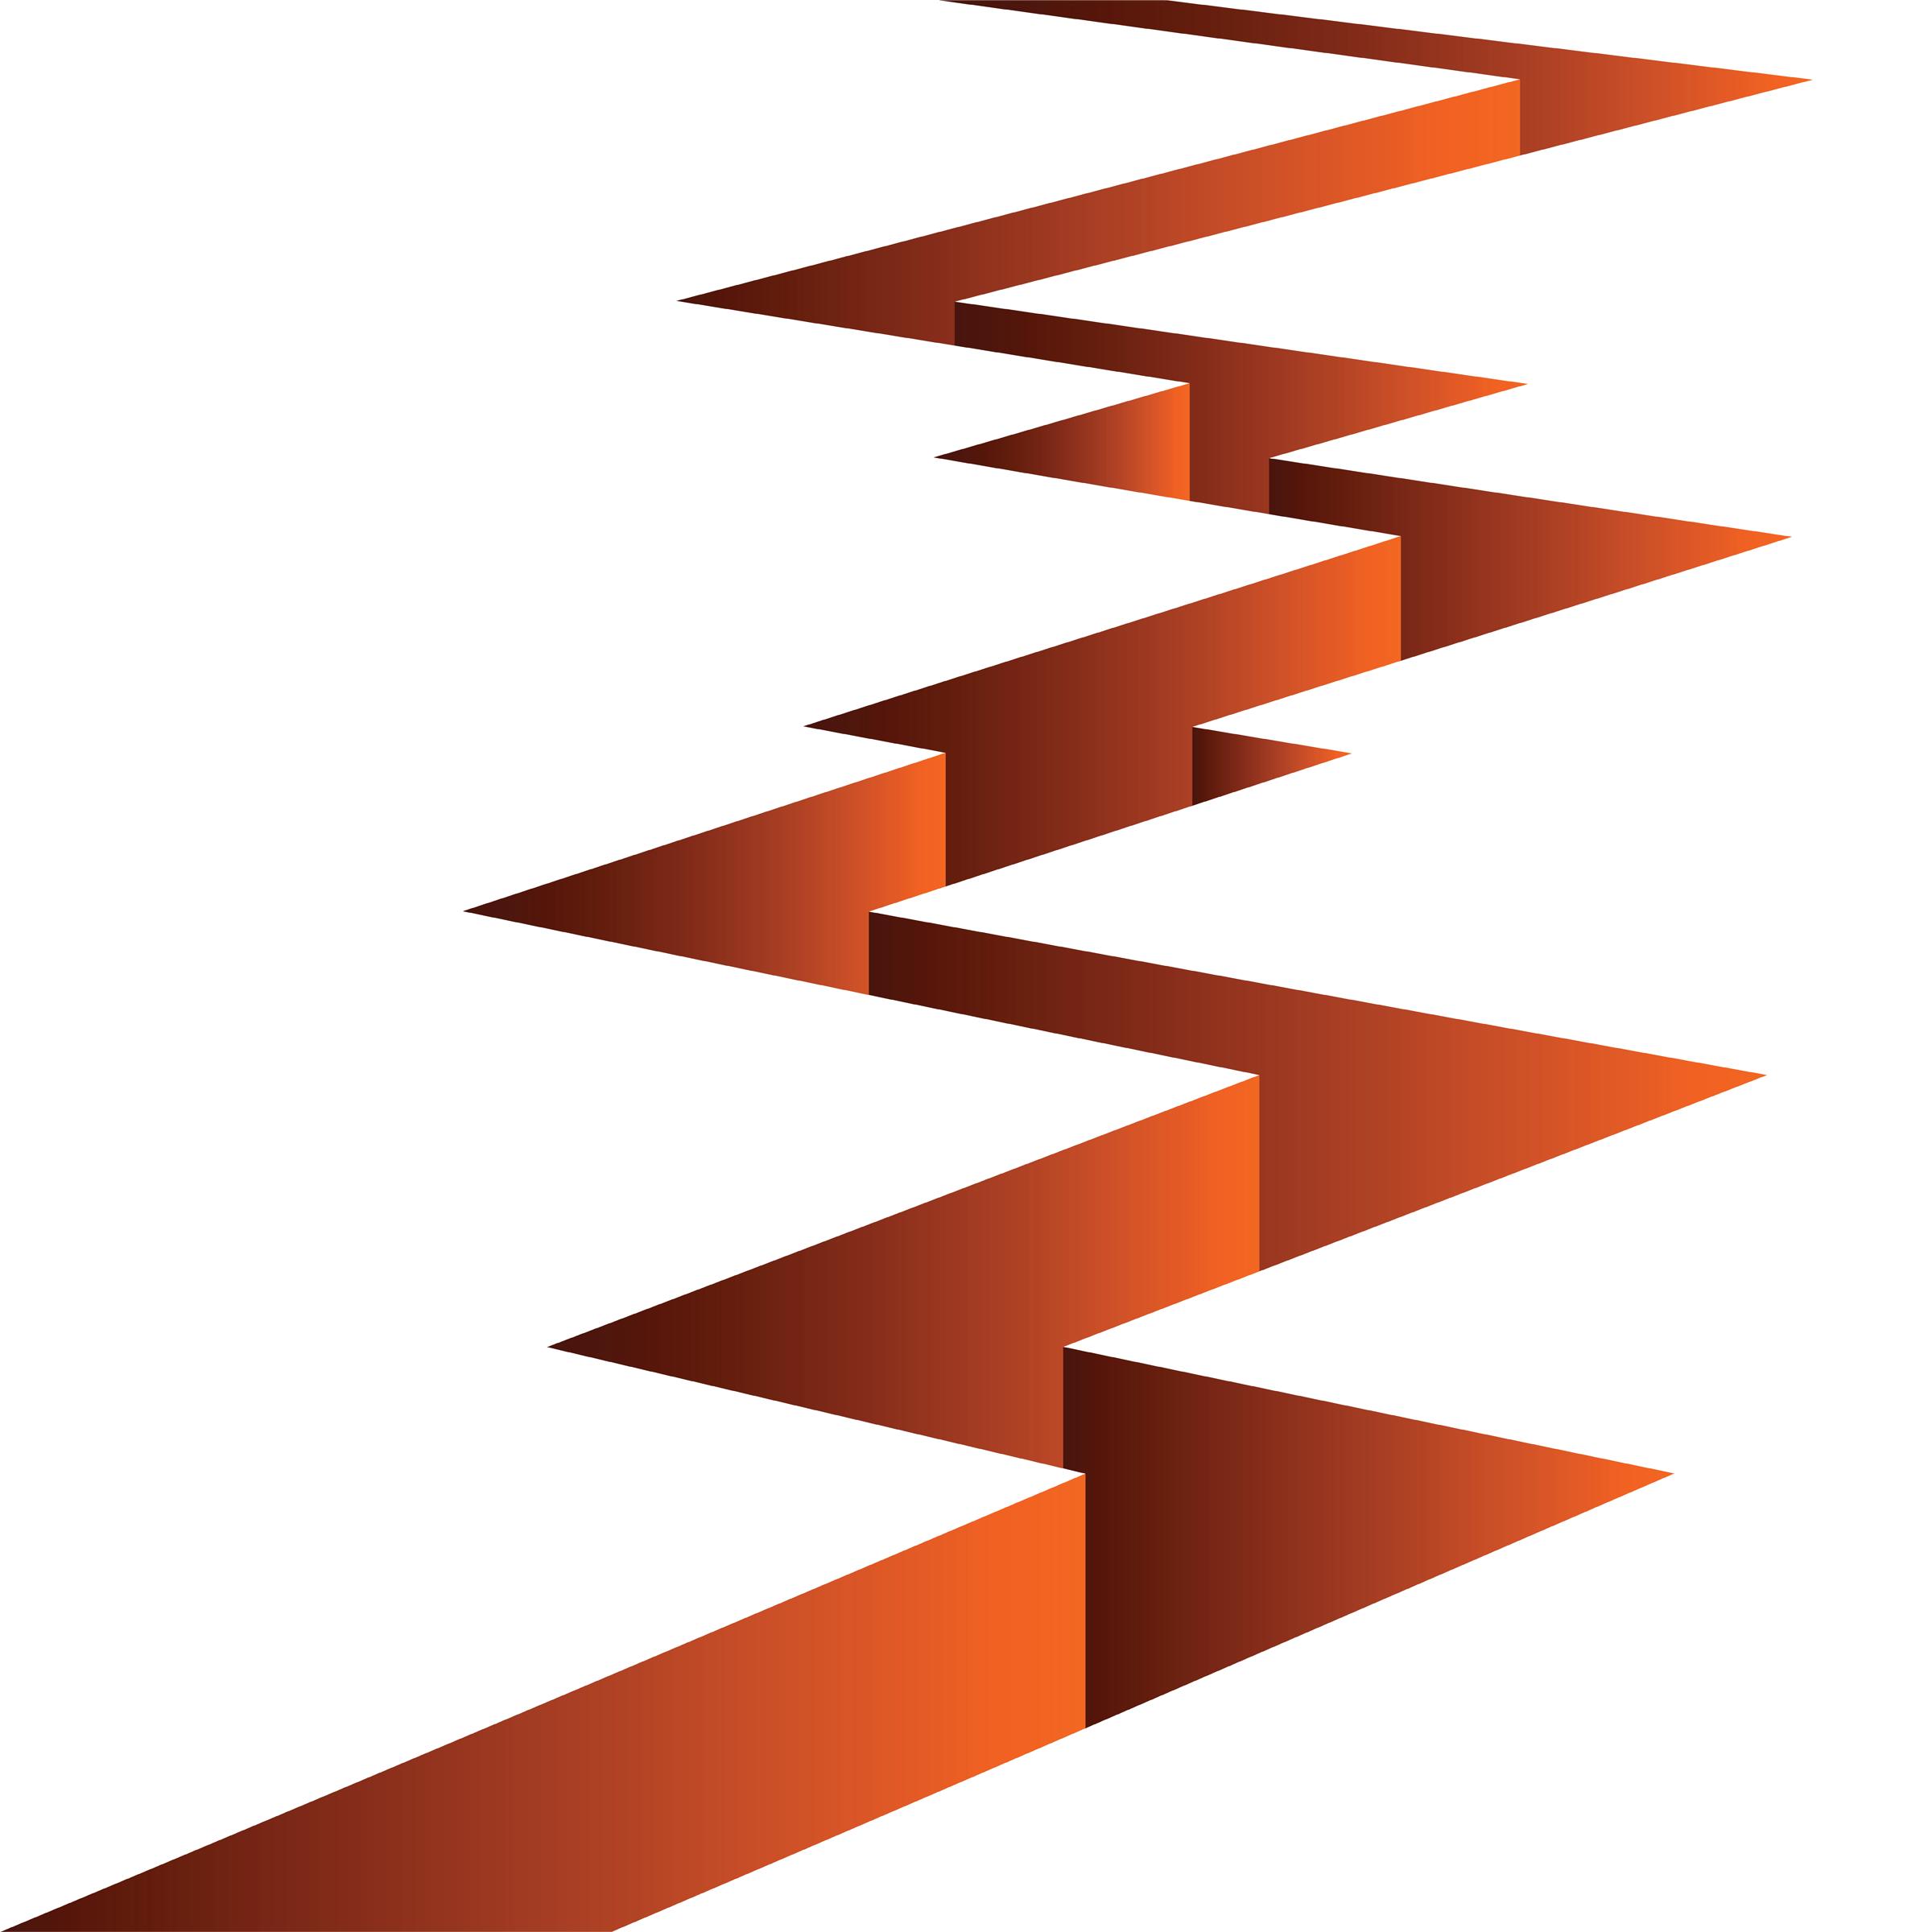 earthquake clipart - Earthquake PNG HD